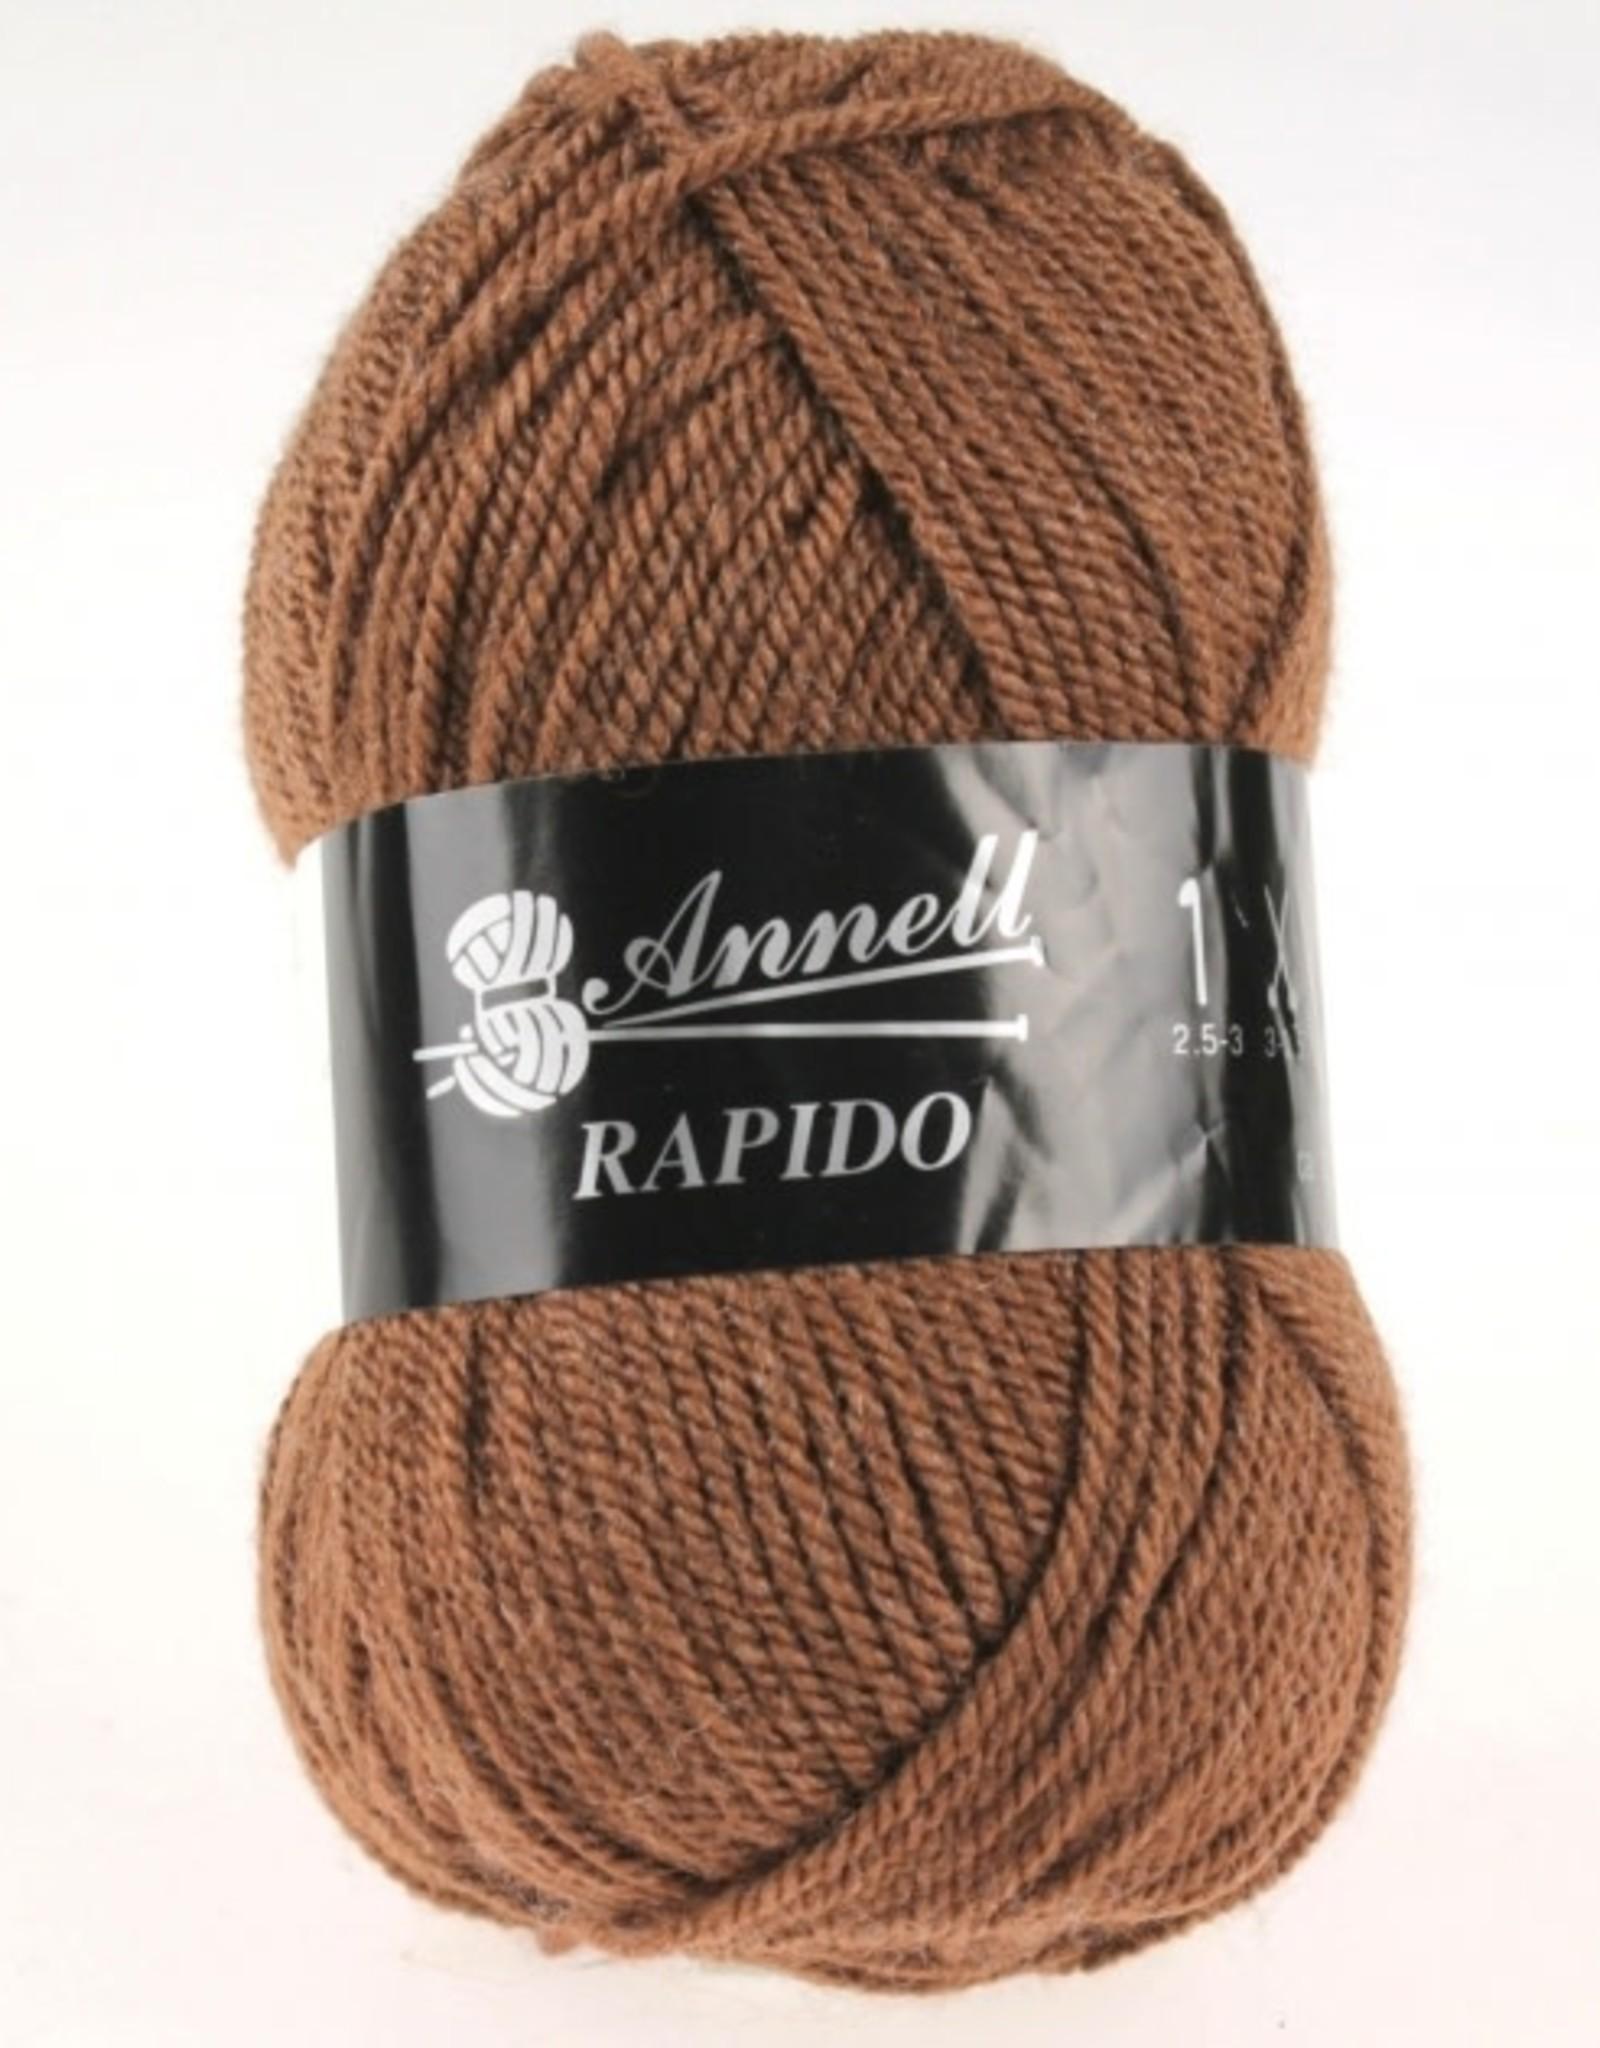 Annell Annell rapido 3211